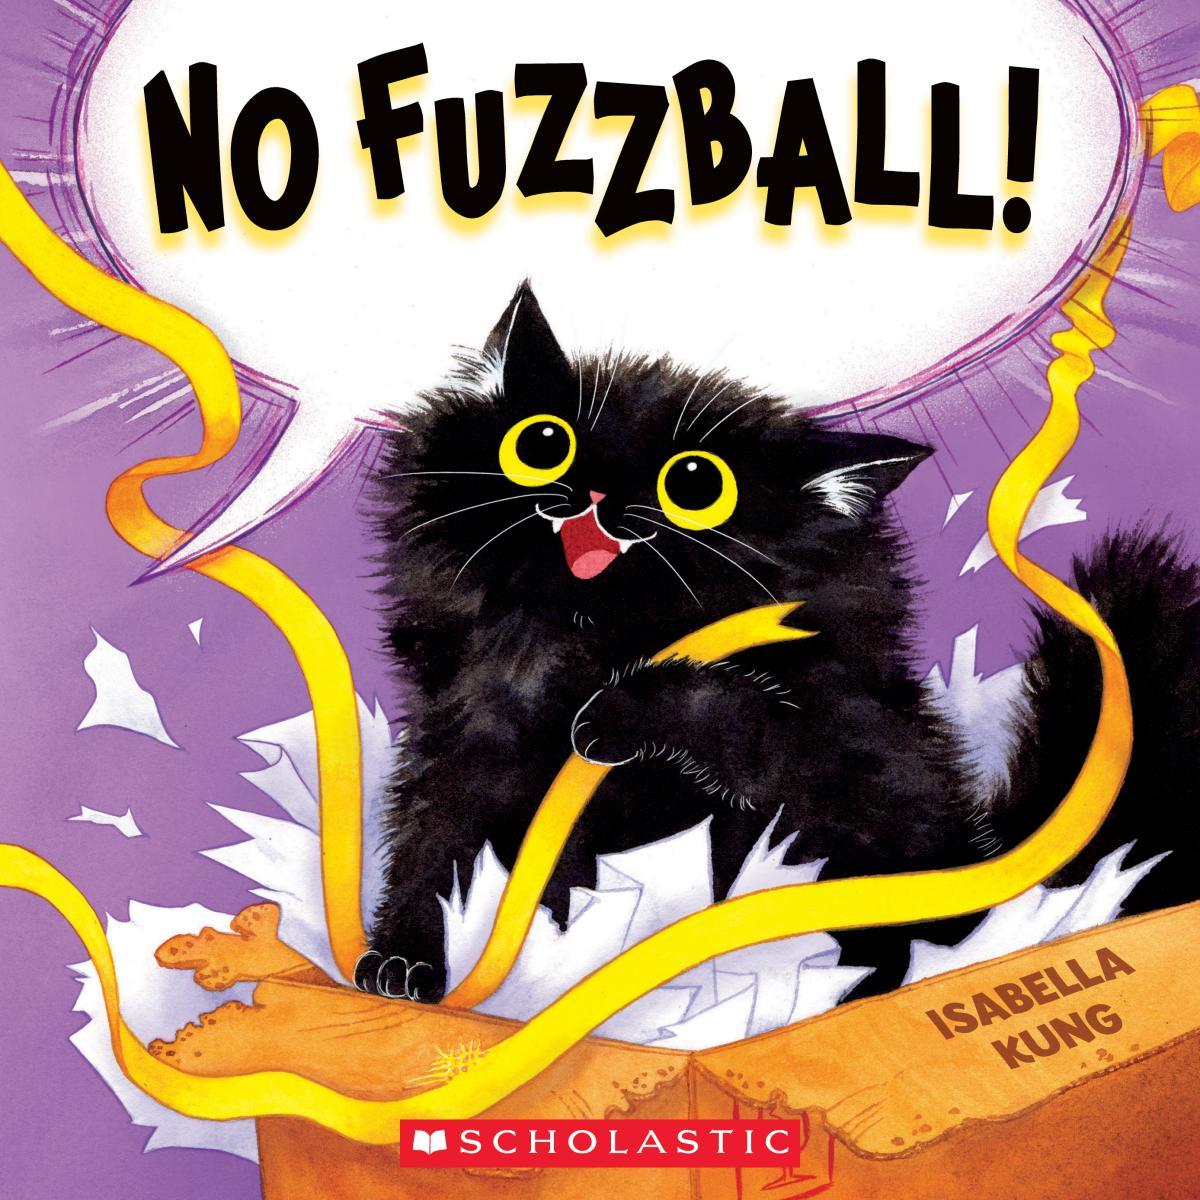 No Fuzzball!